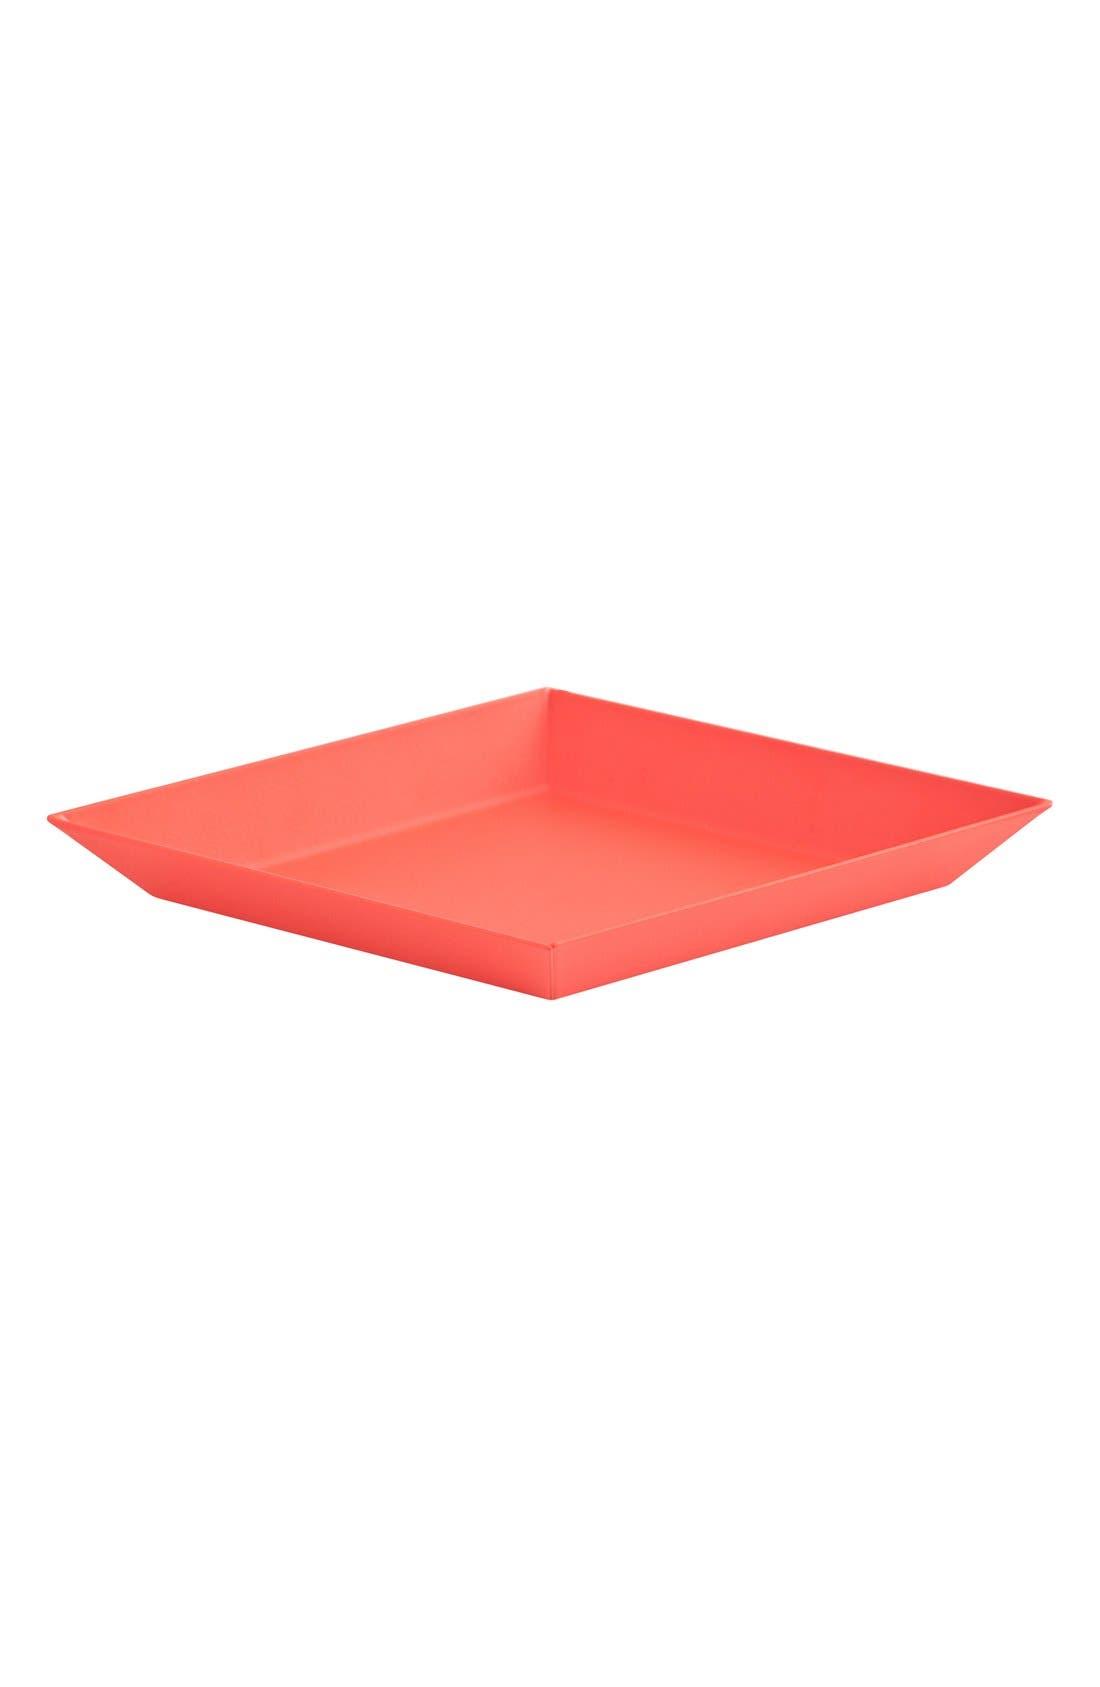 Alternate Image 1 Selected - HAY 'Kaleido - Extra Small' Decorative Tray